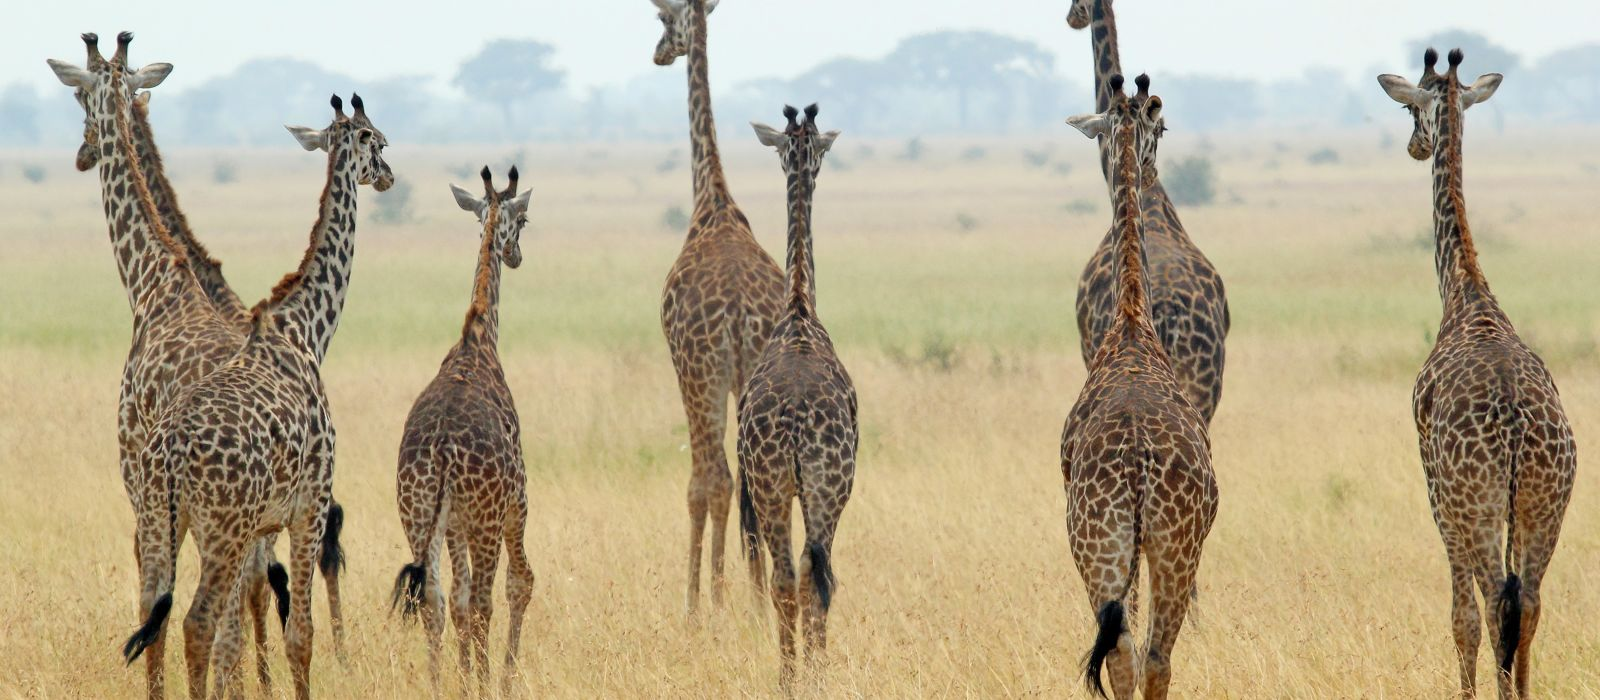 Tansania: Safari Abenteuer & romantisches Sansibar Urlaub 3